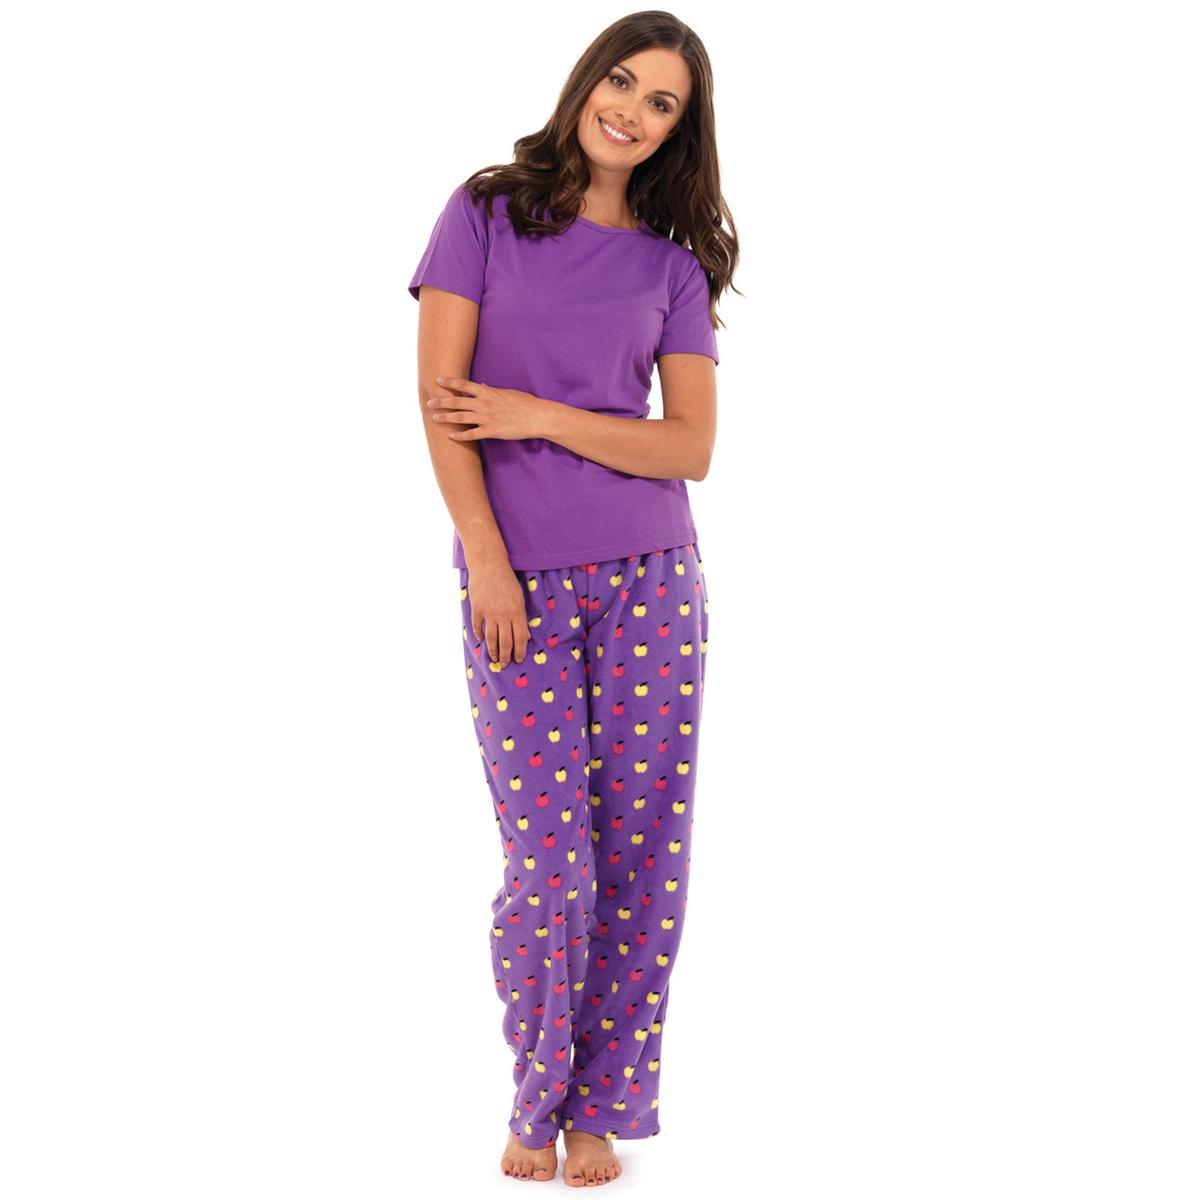 ladies womens pj fleece pyjamas sets night wear mushrooms. Black Bedroom Furniture Sets. Home Design Ideas